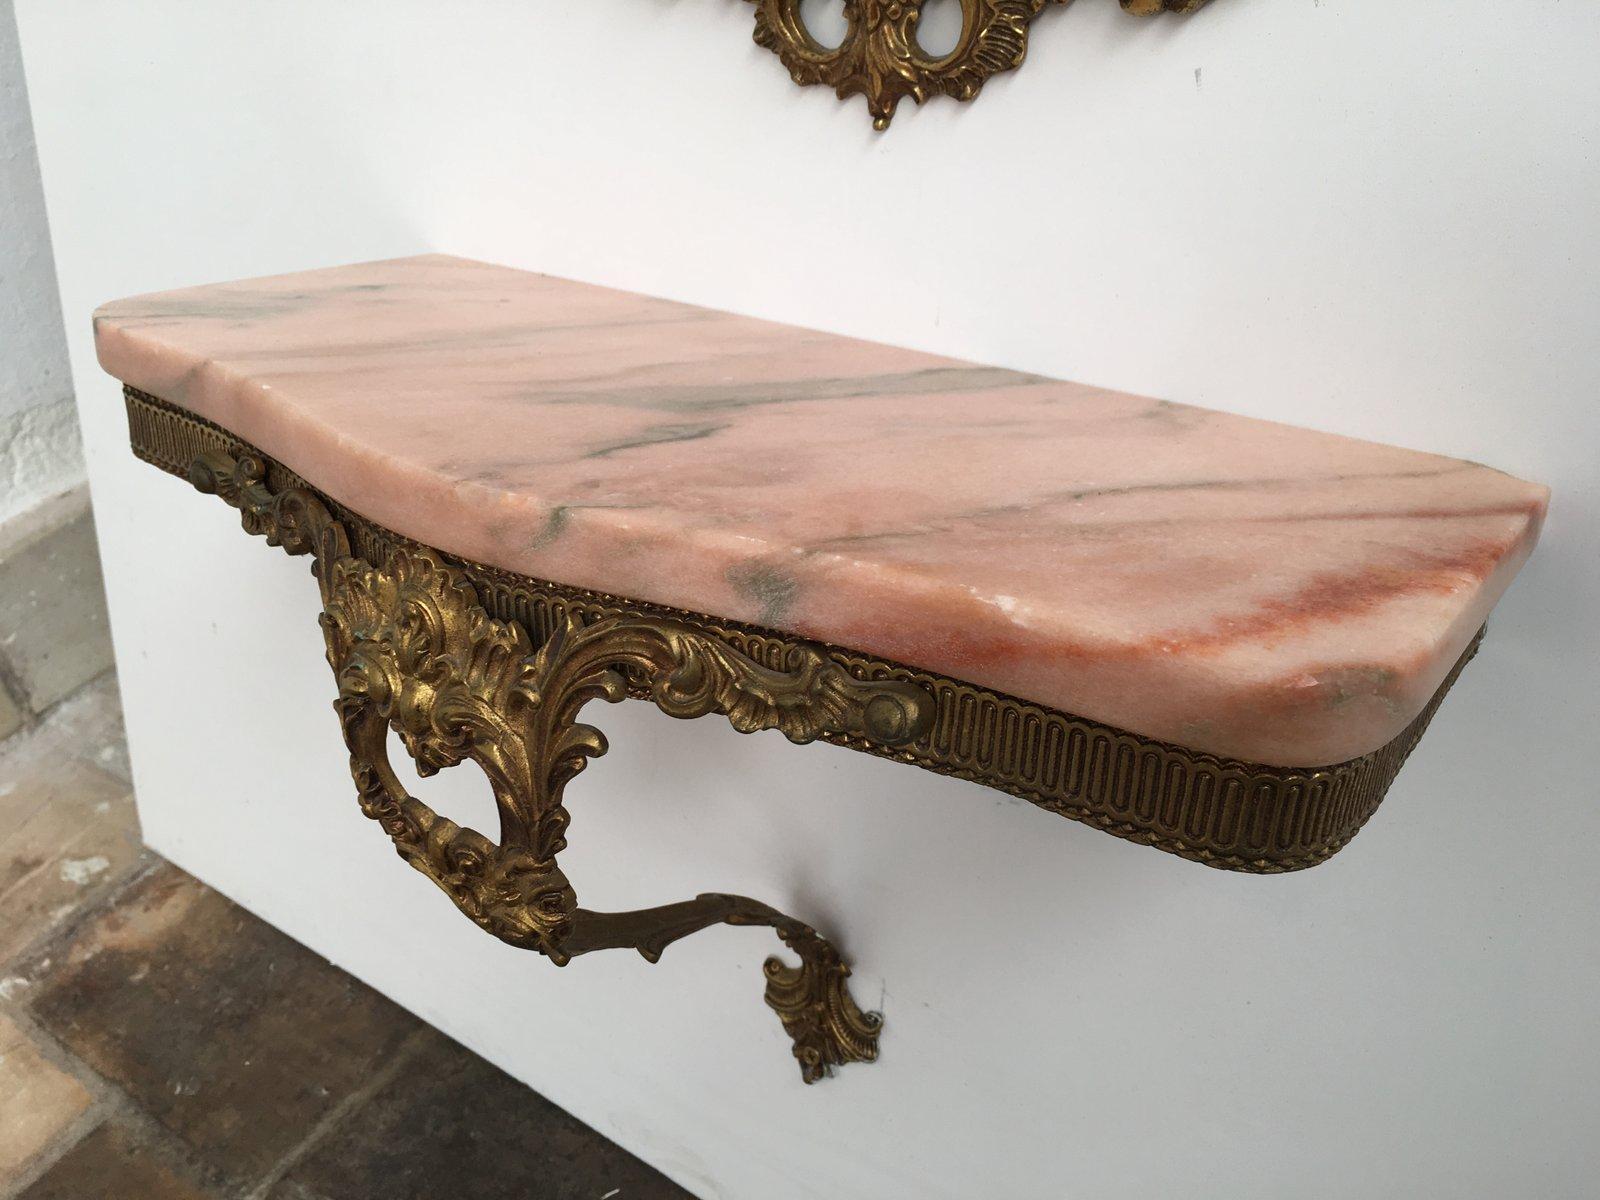 antiker barocker italienischer wandspiegel konsole aus messing rosa marmor bei pamono kaufen. Black Bedroom Furniture Sets. Home Design Ideas